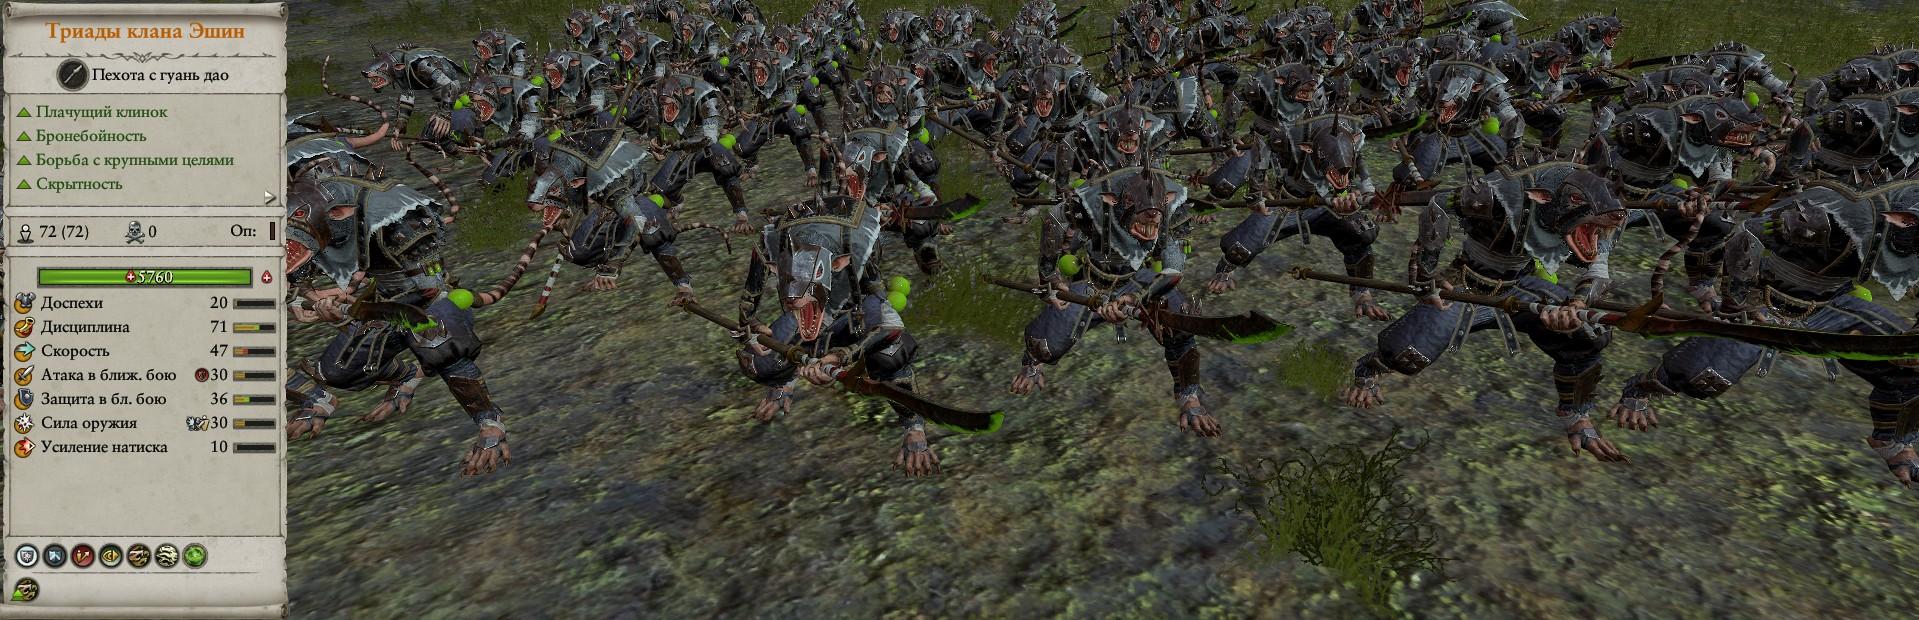 Триады клана Эшин warhammer